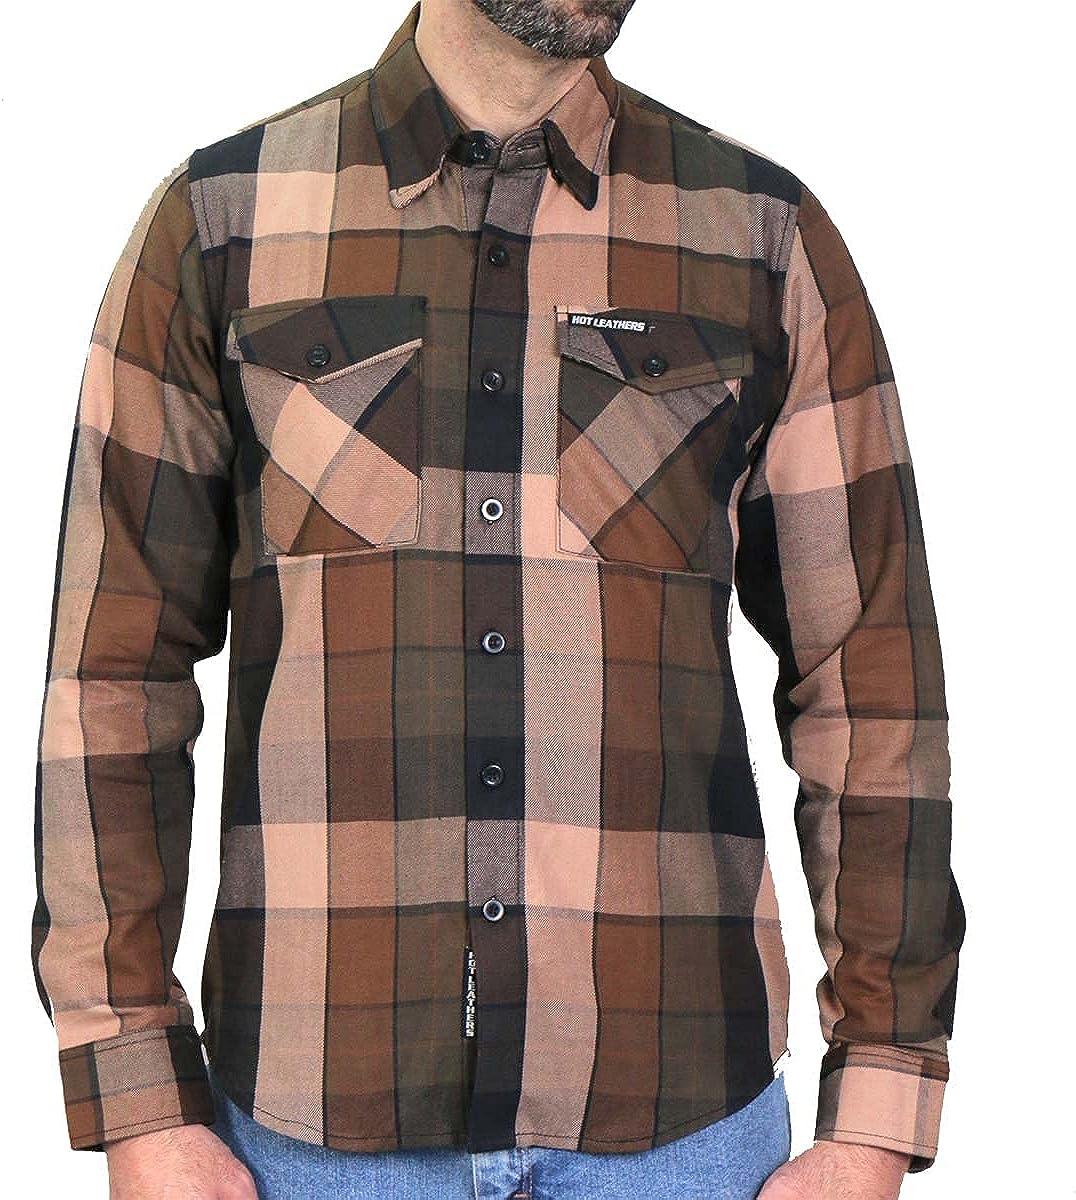 Hot Leathers FLM2013 Men's 'Sidewinder' Flannel Long Sleeve Shirt